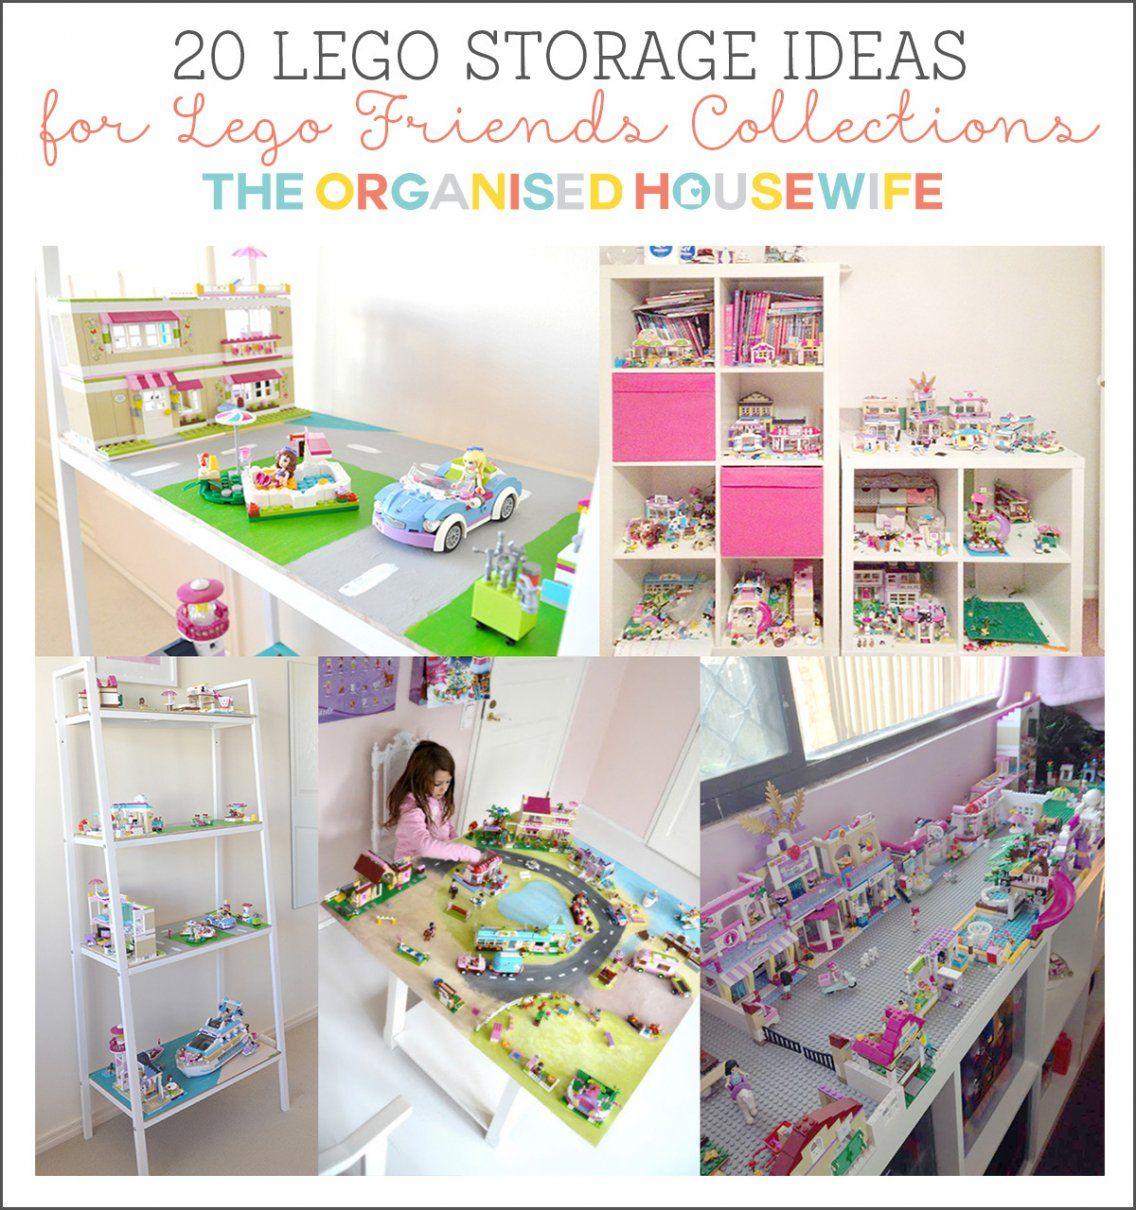 20 Lego Storage Ideas For Girls The Organised Housewife Lego Friends Storage Lego Storage Lego Room